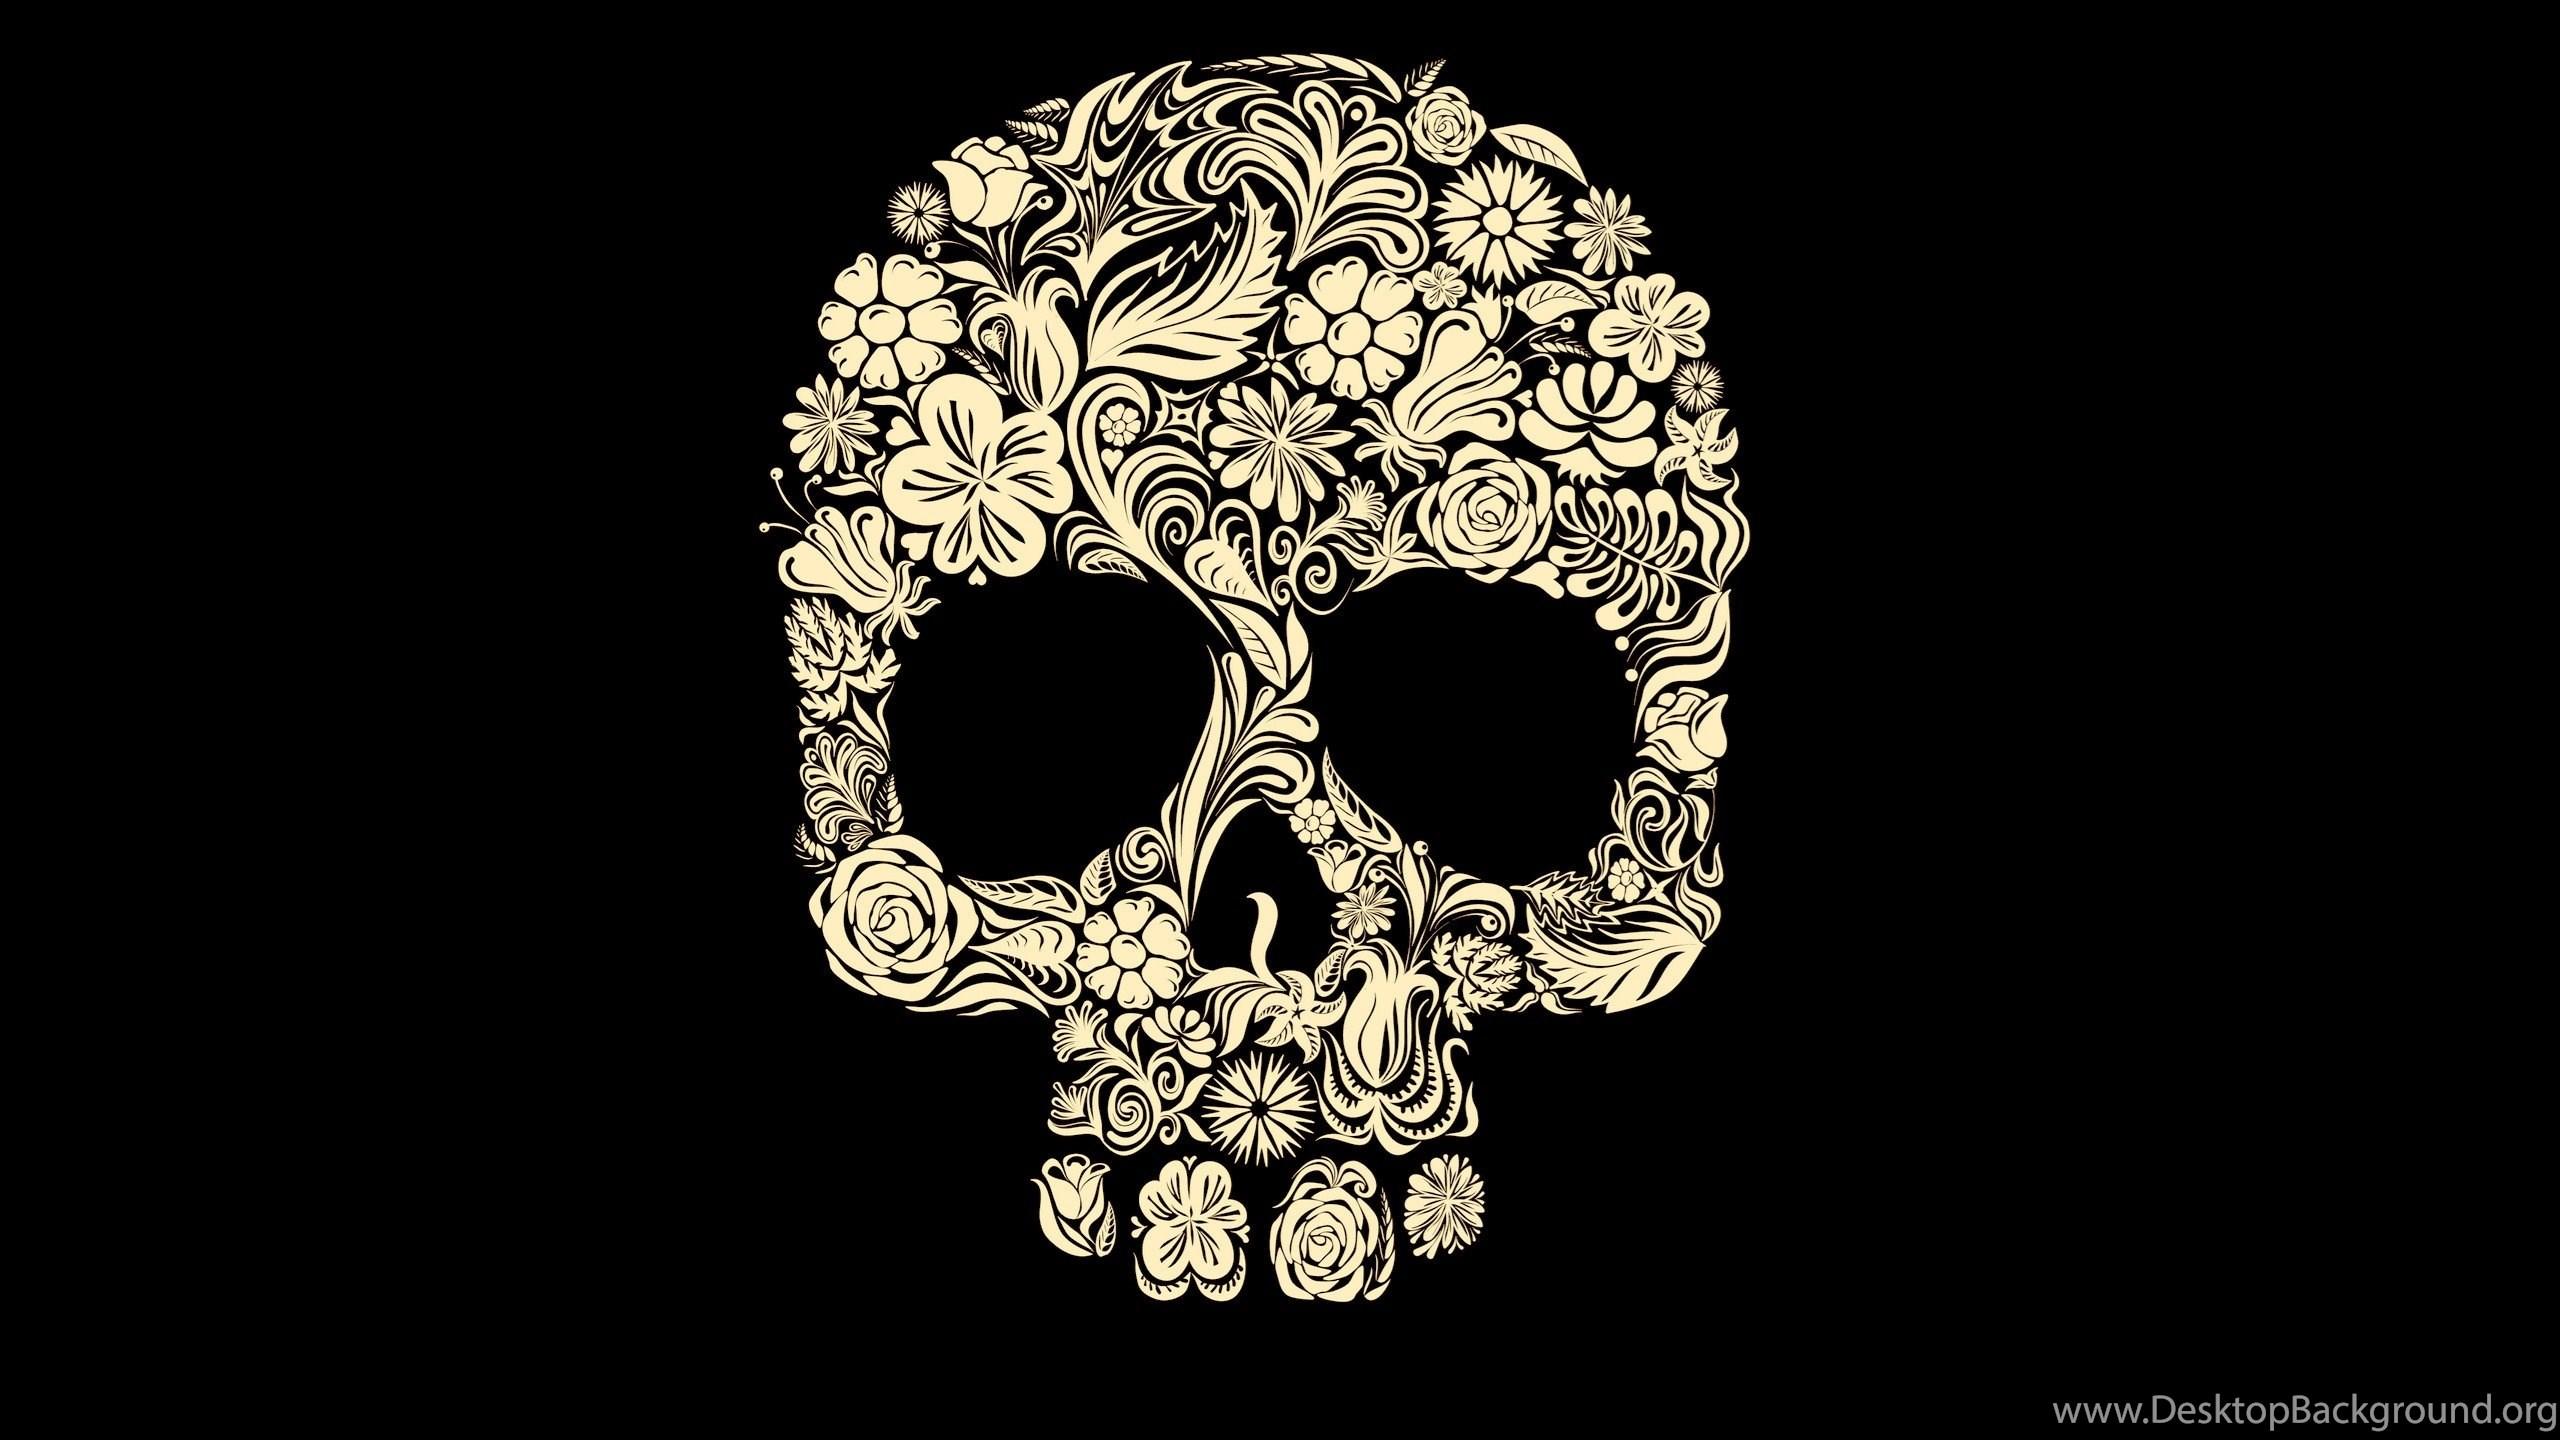 Abstract Skull Wallpapers Desktop Background